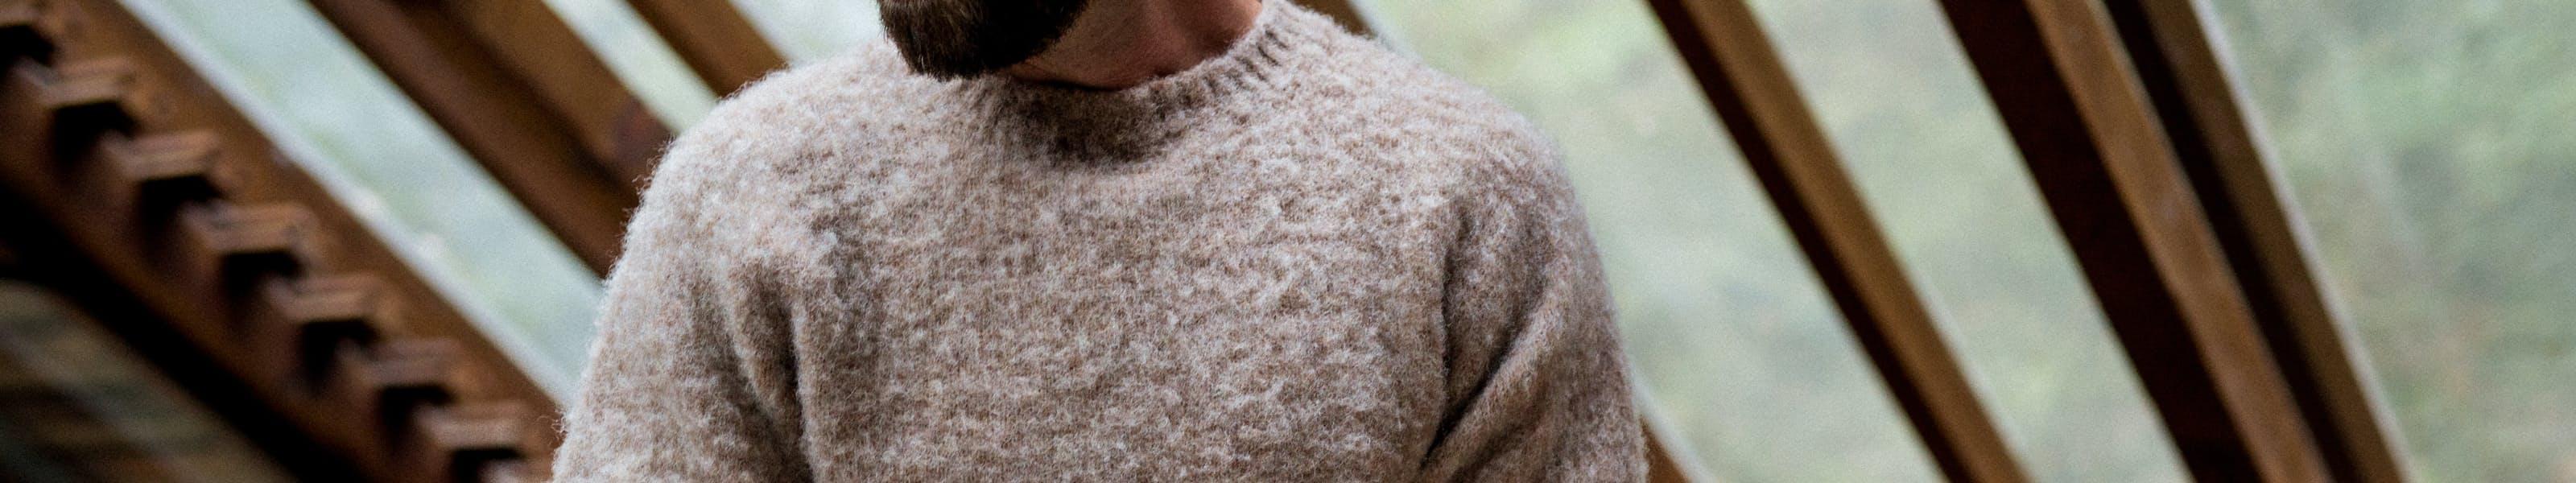 51198 shetlandwoollenco shaggydogsweater camel lifestyle 05.jpg?ixlib=rails 2.1